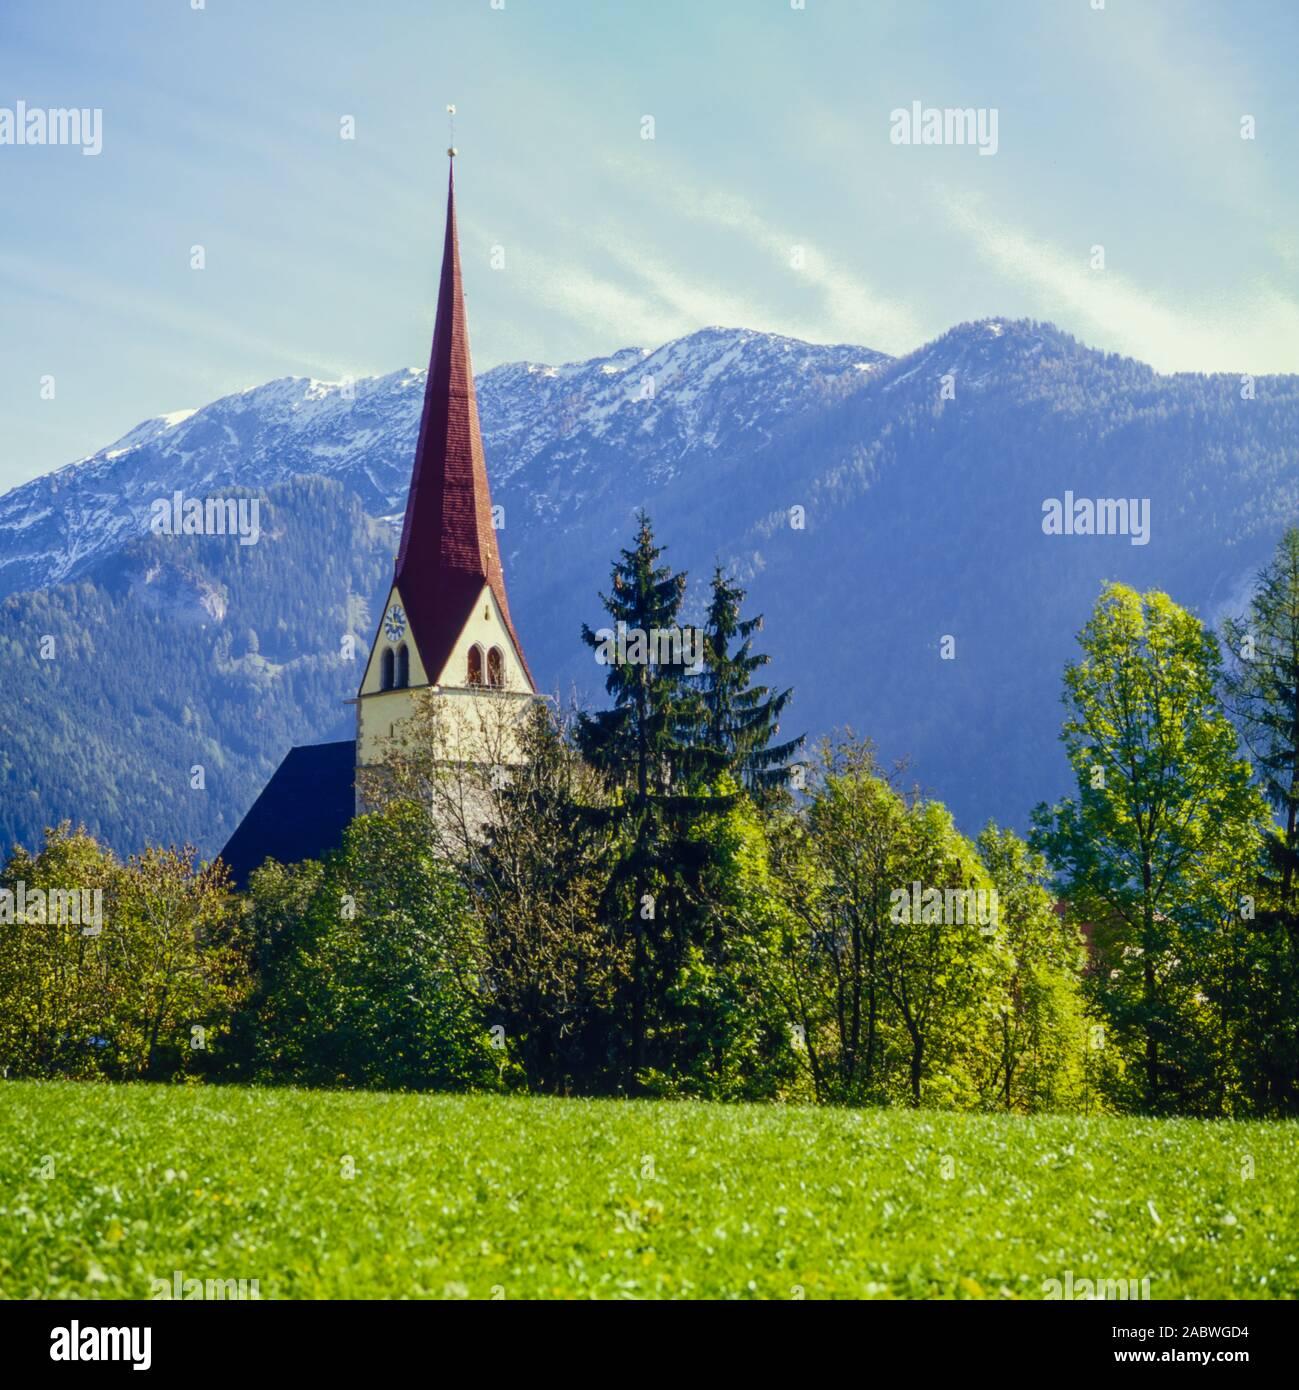 kirche von achenkirch, tirol, vor hochgebirgs-gebirgspanorama. church of achenkirch, tyrol in front of mountainridge. Stock Photo